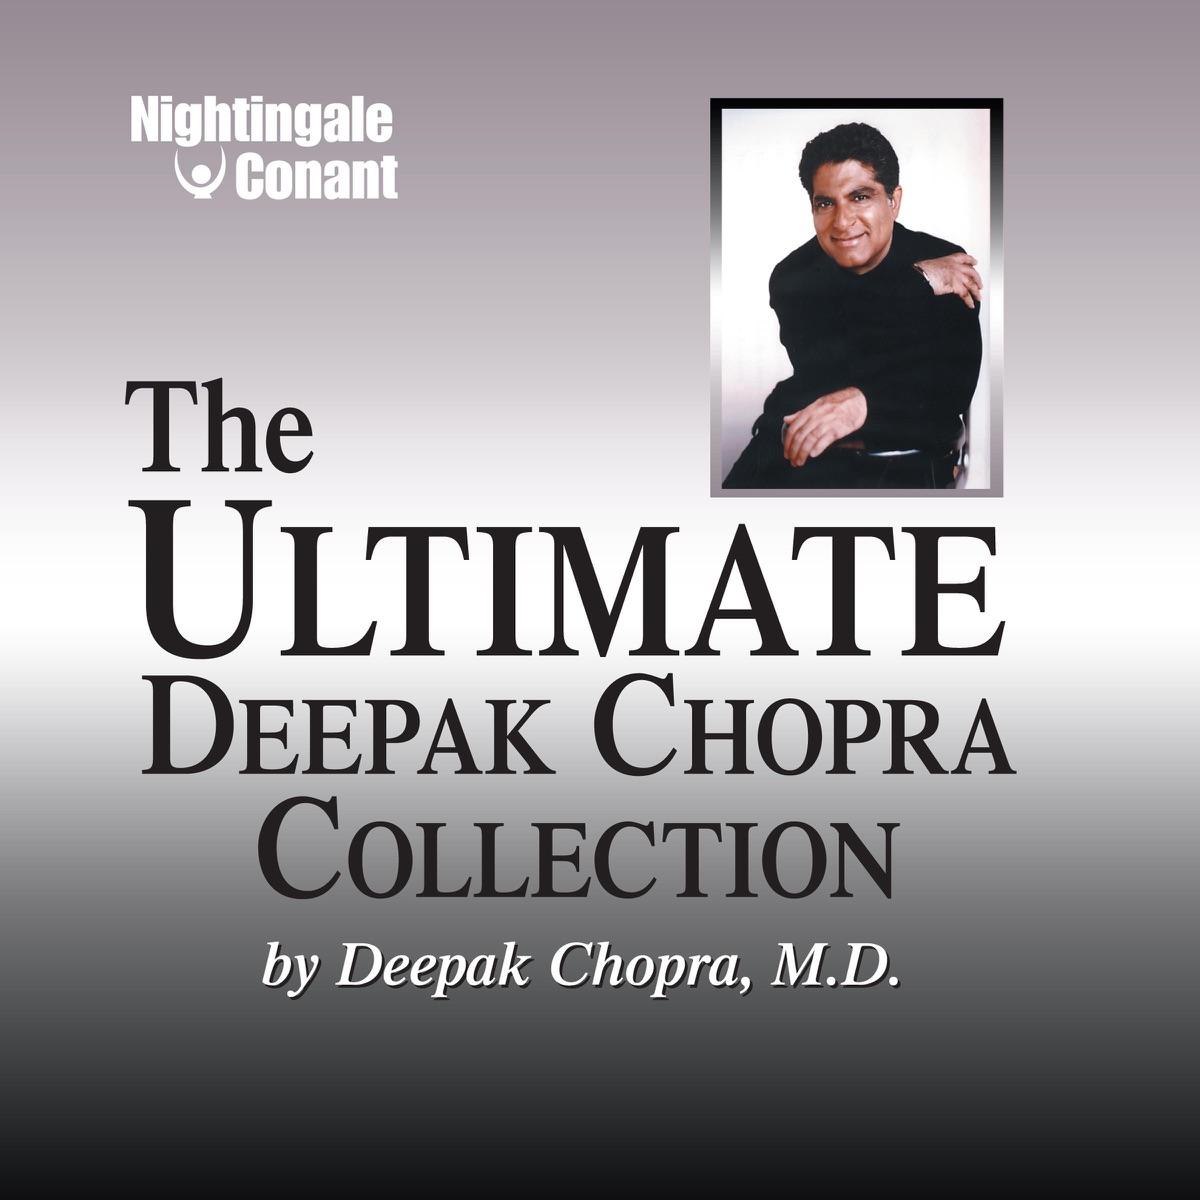 The Ultimate Deepak Chopra Collection Album Cover By Deepak